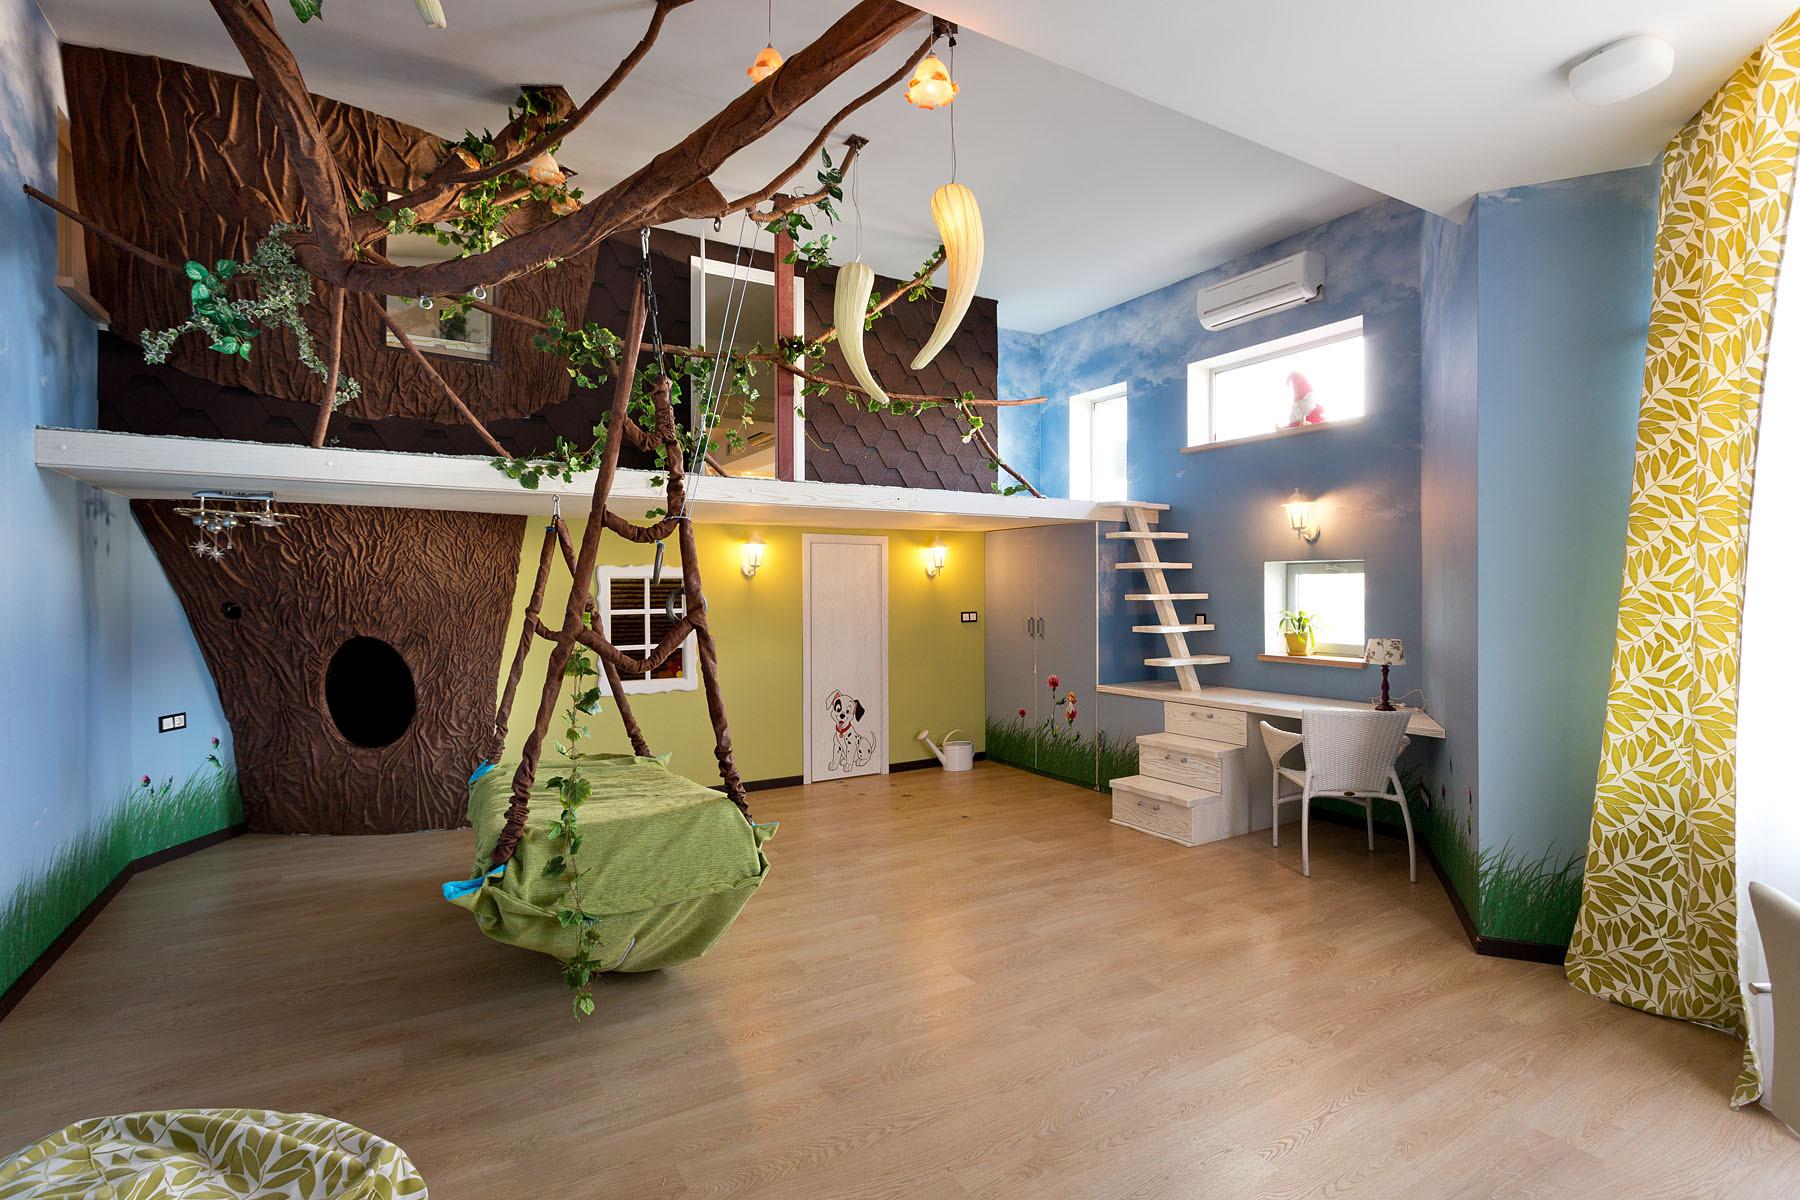 Необычный дизайн комнаты фото